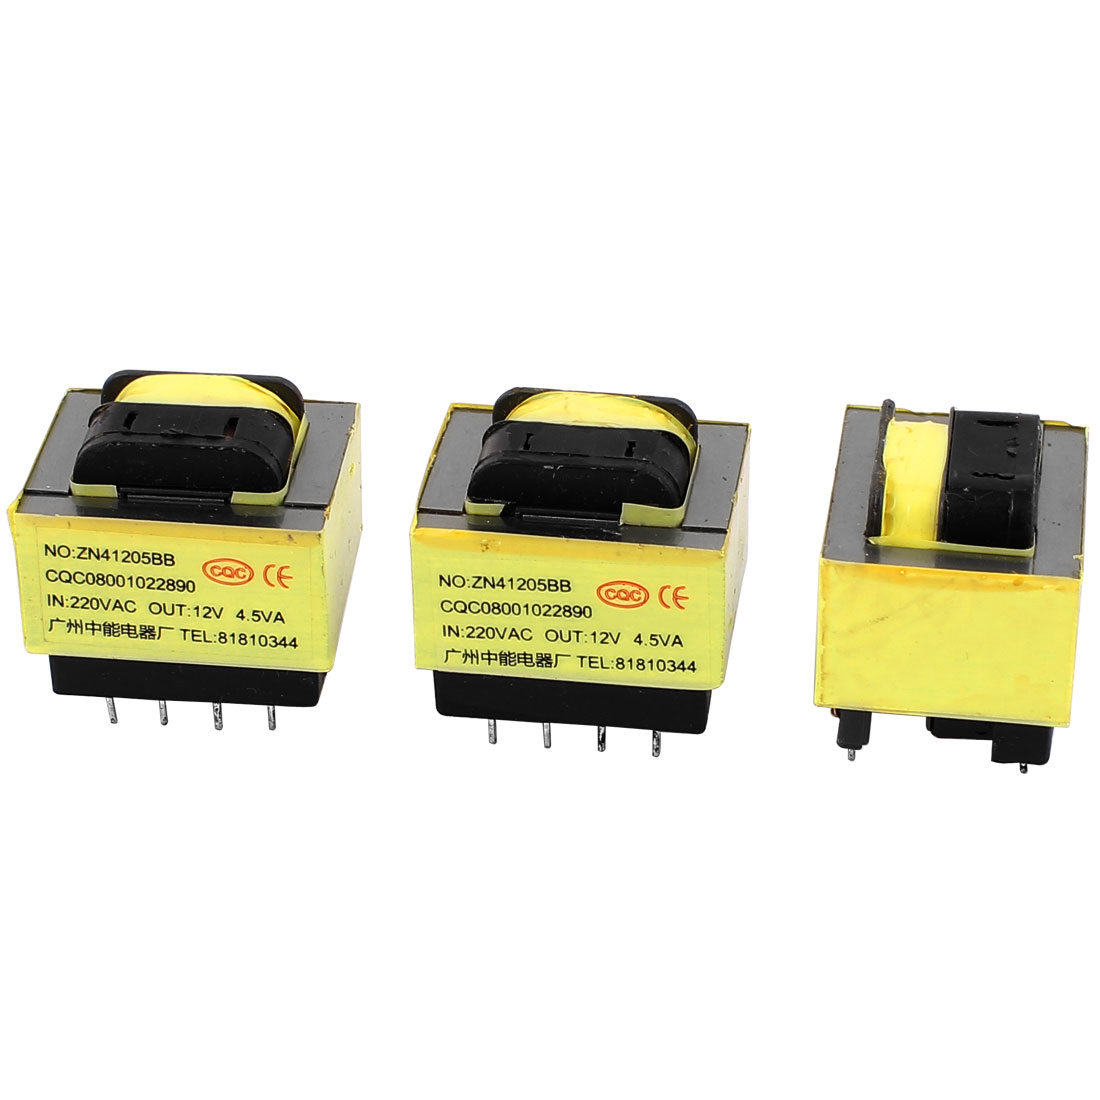 3Pcs 220V Input 12V 4.5VA Output Yellow Red Ferrite Core Power Transformer w 9 Terminals